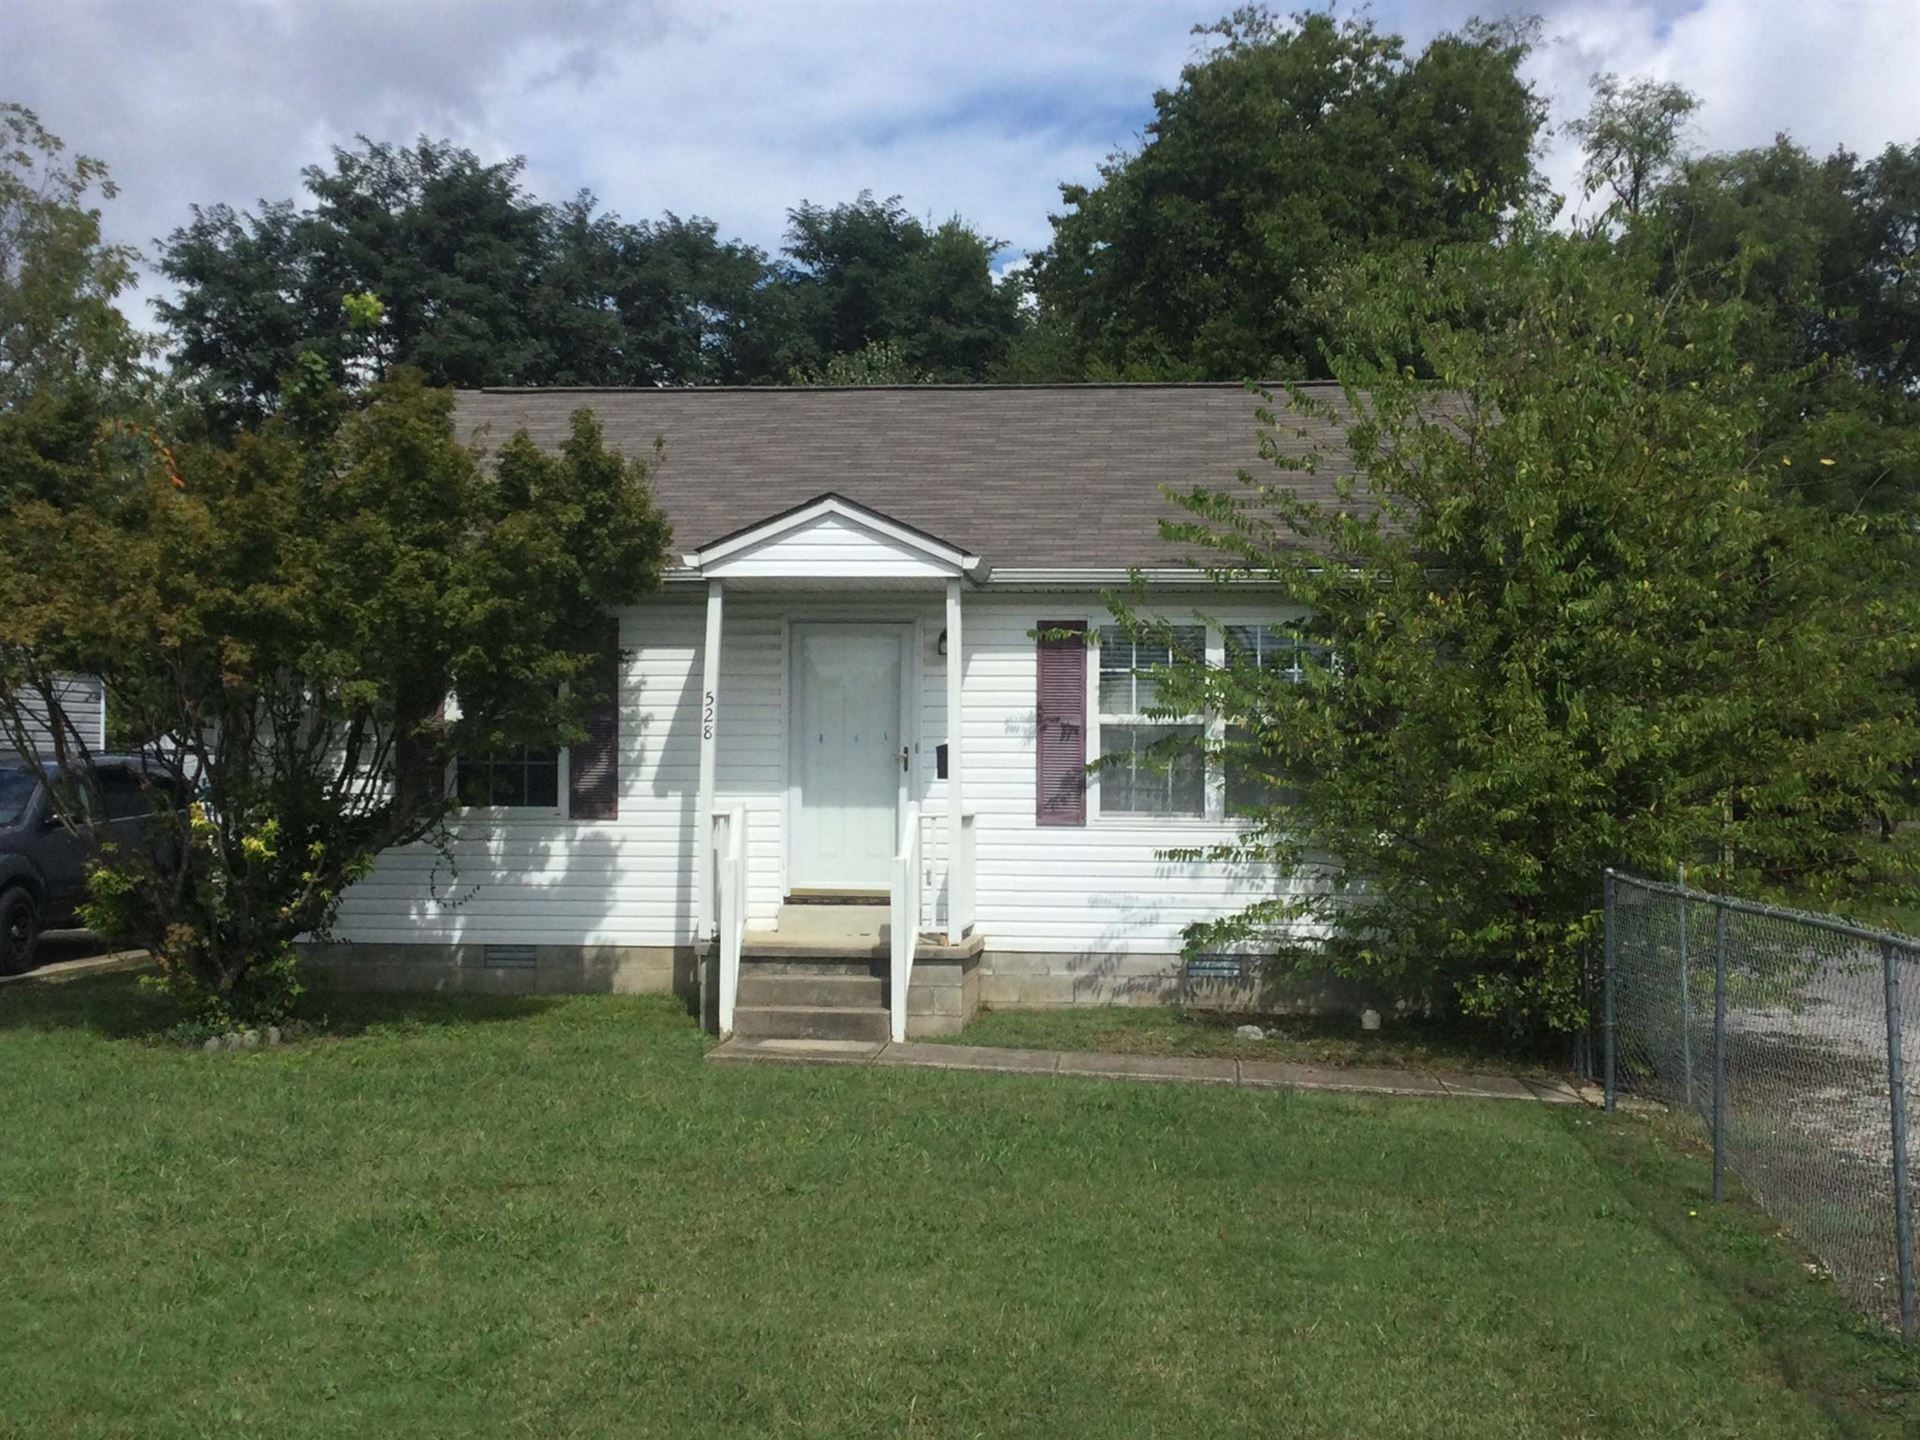 528 Bridge Ave, Murfreesboro, TN 37129 - MLS#: 2298513